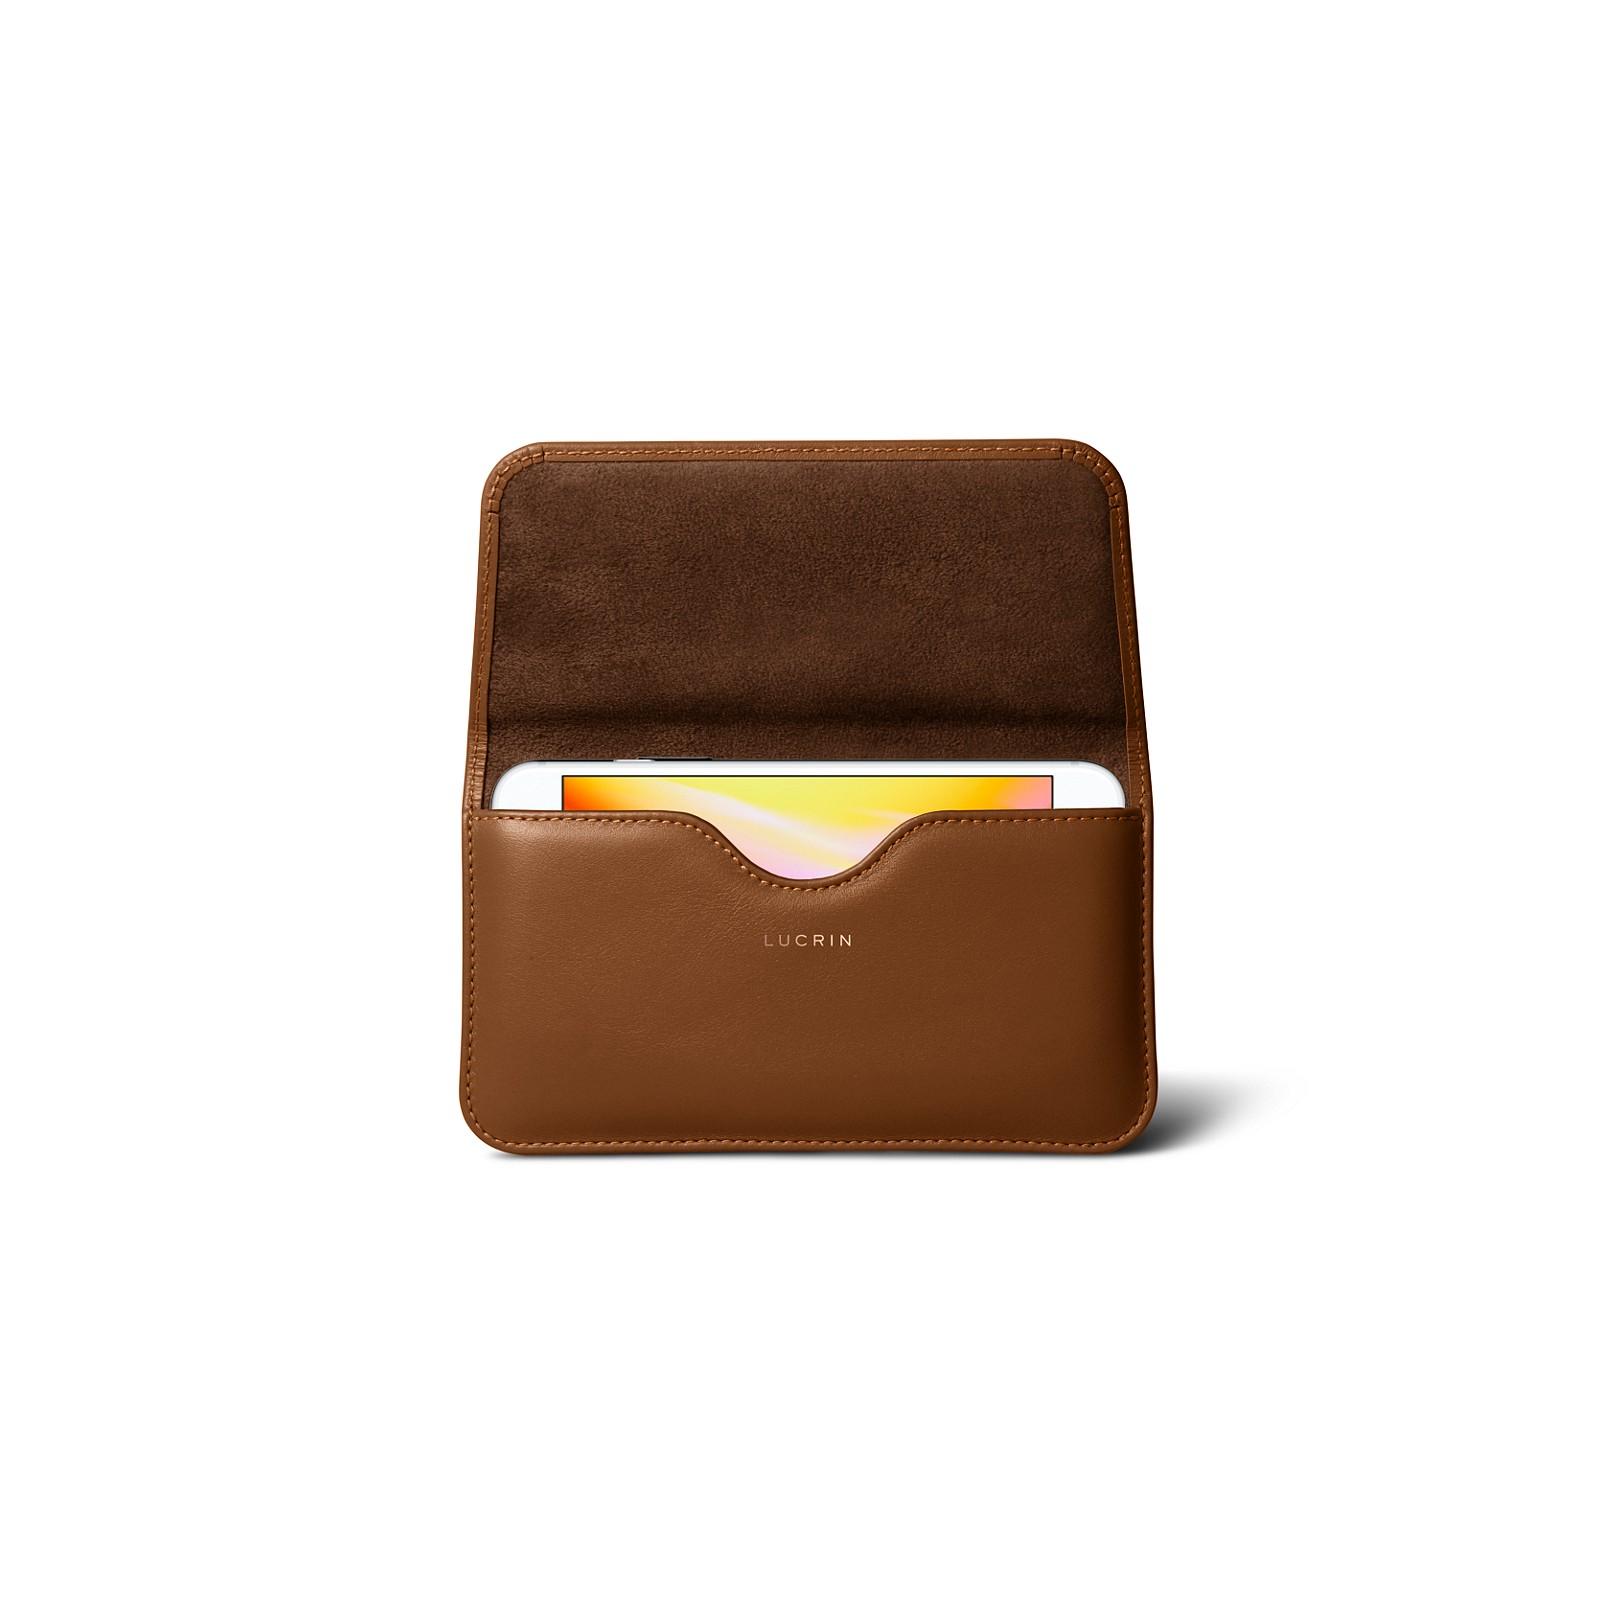 new style ec532 cca3c Belt case for iPhone 8 Plus